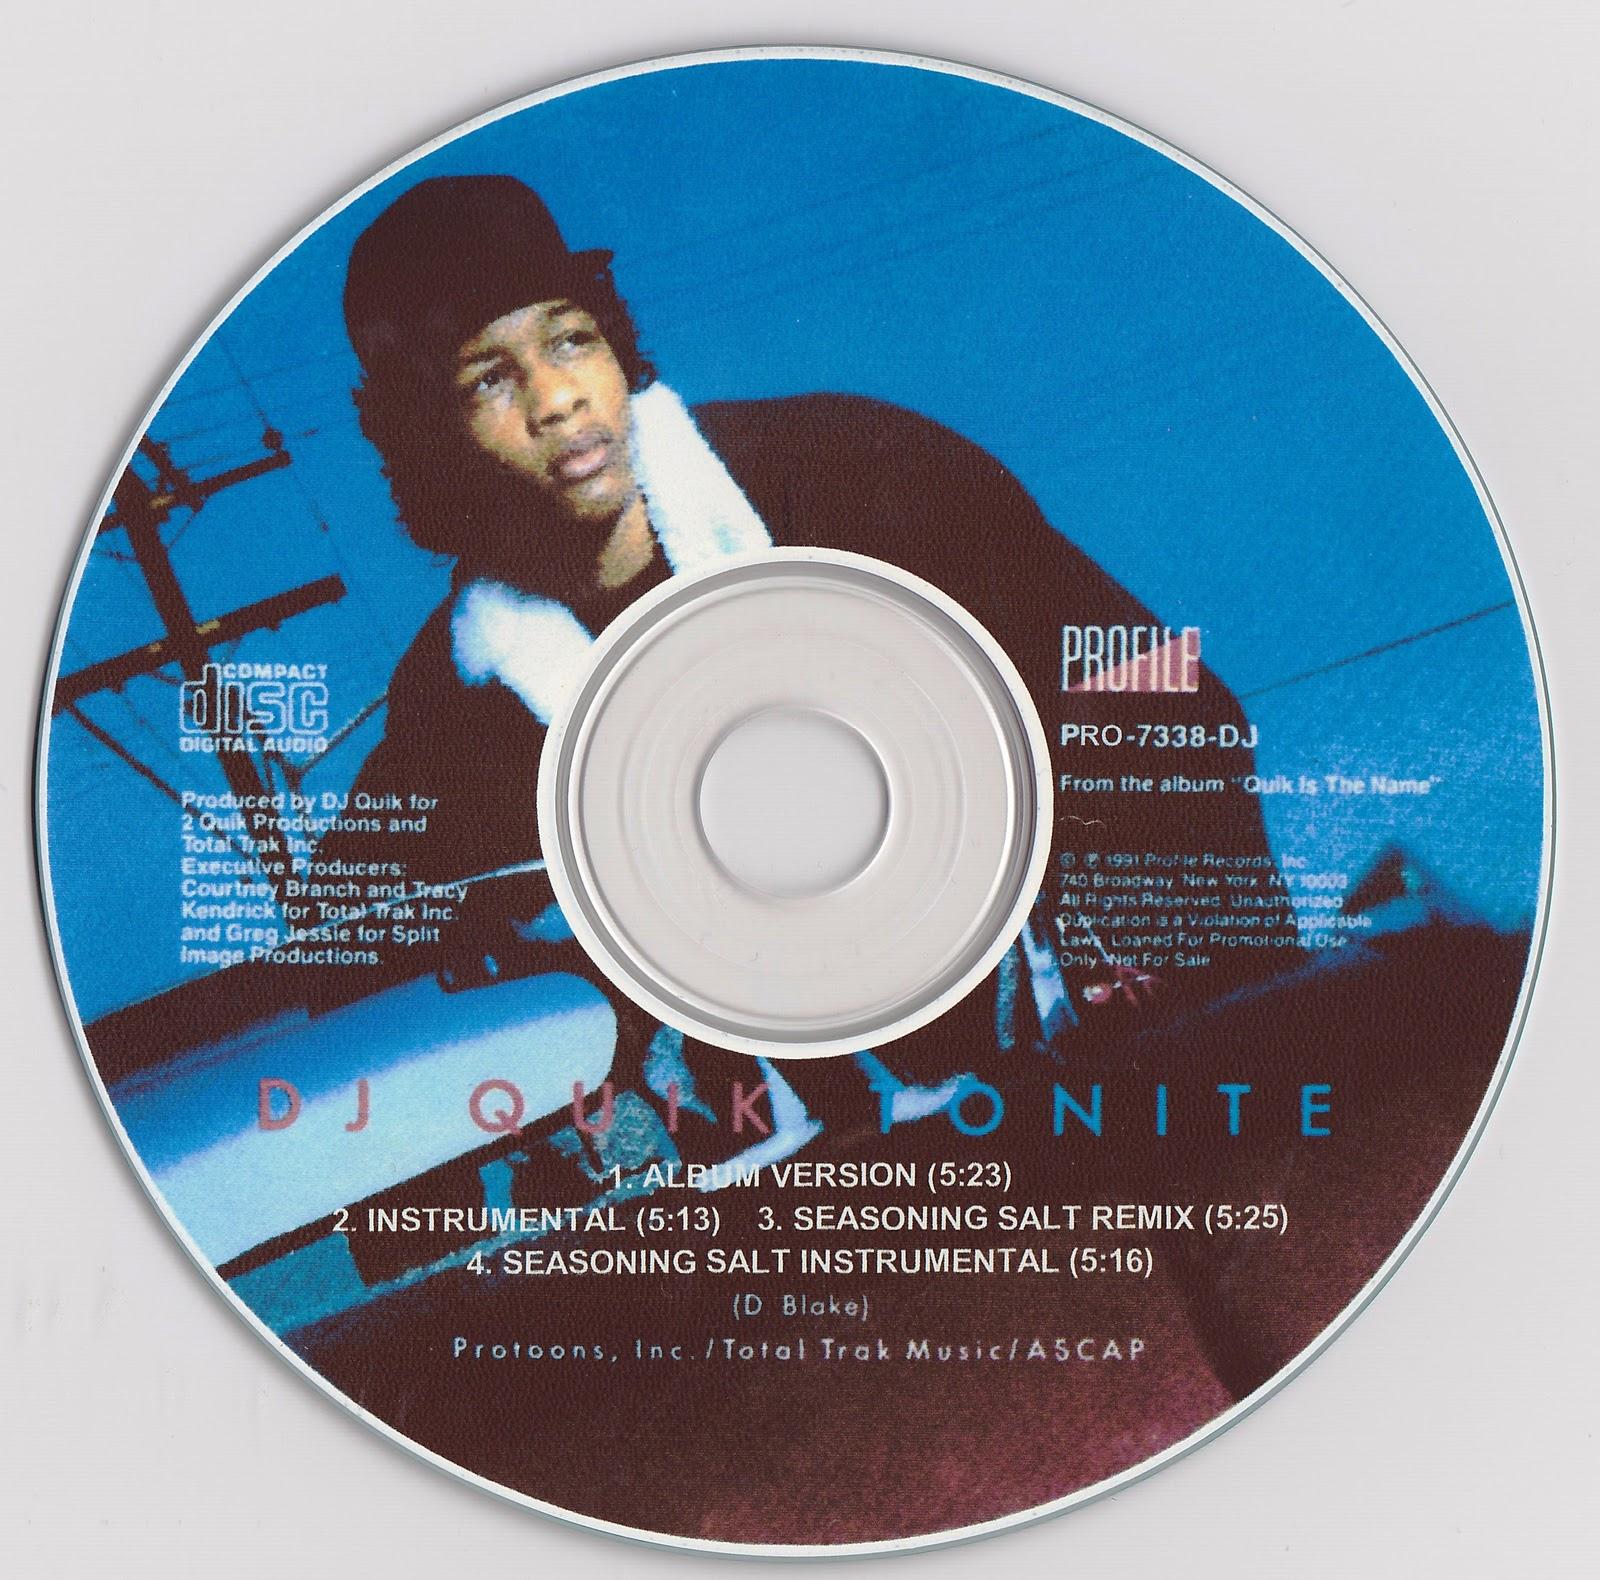 http://1.bp.blogspot.com/_7aFG1JabCYY/TTvYjtxxNzI/AAAAAAAAAJ4/0oJh5OrXphU/s1600/DJ+Quik+Tonite+CD.jpg